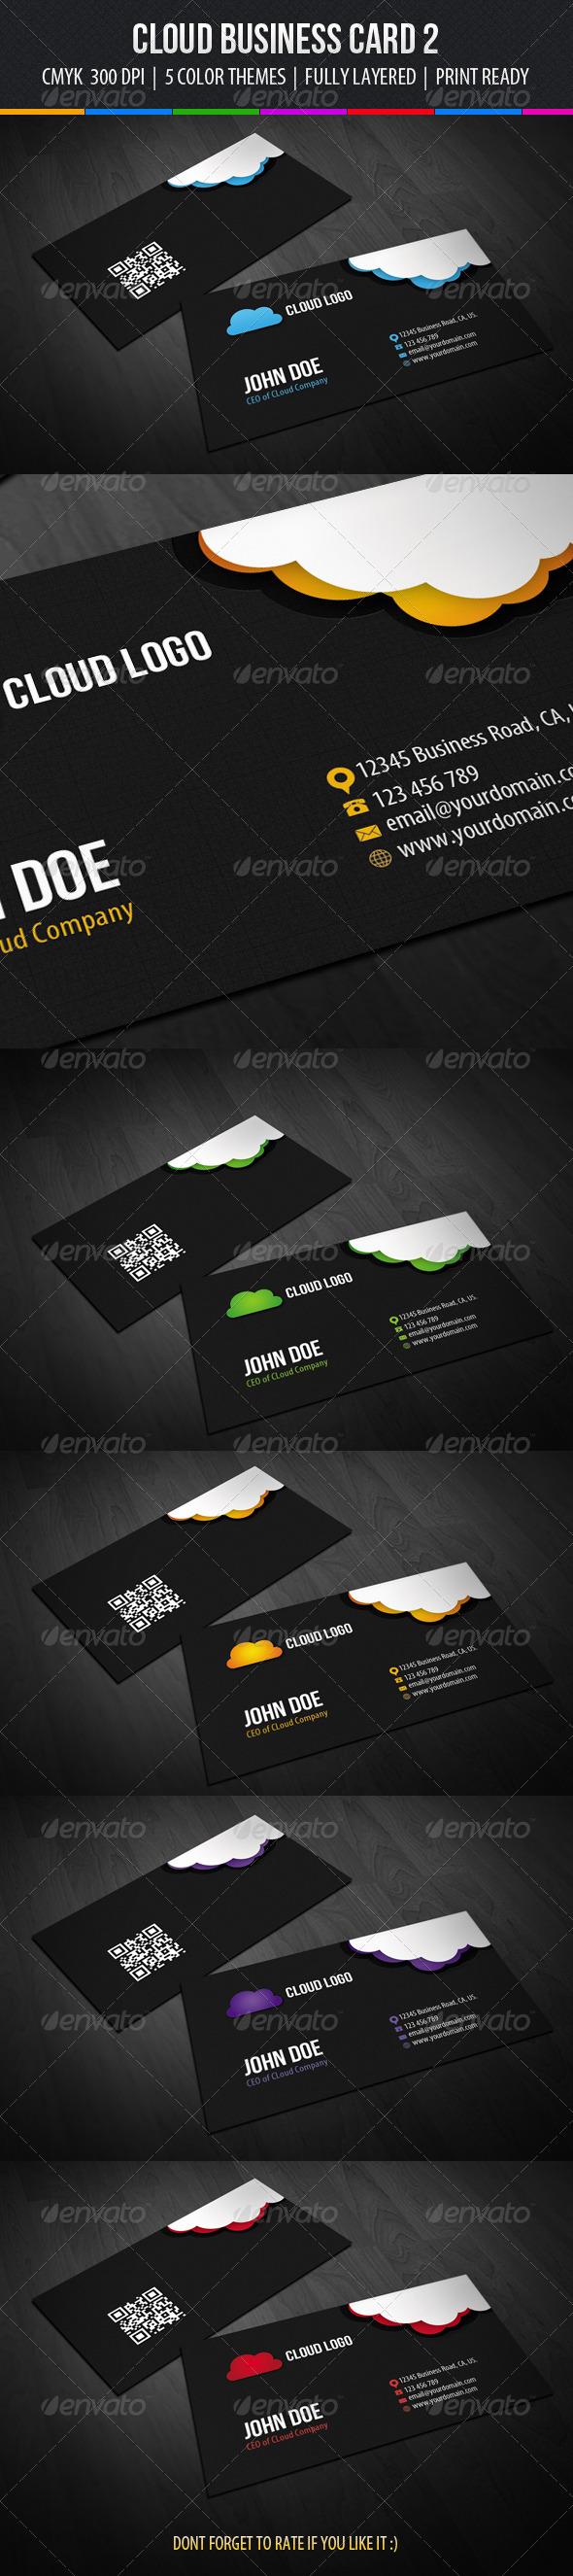 GraphicRiver Cloud Business Card Design 2 6345370